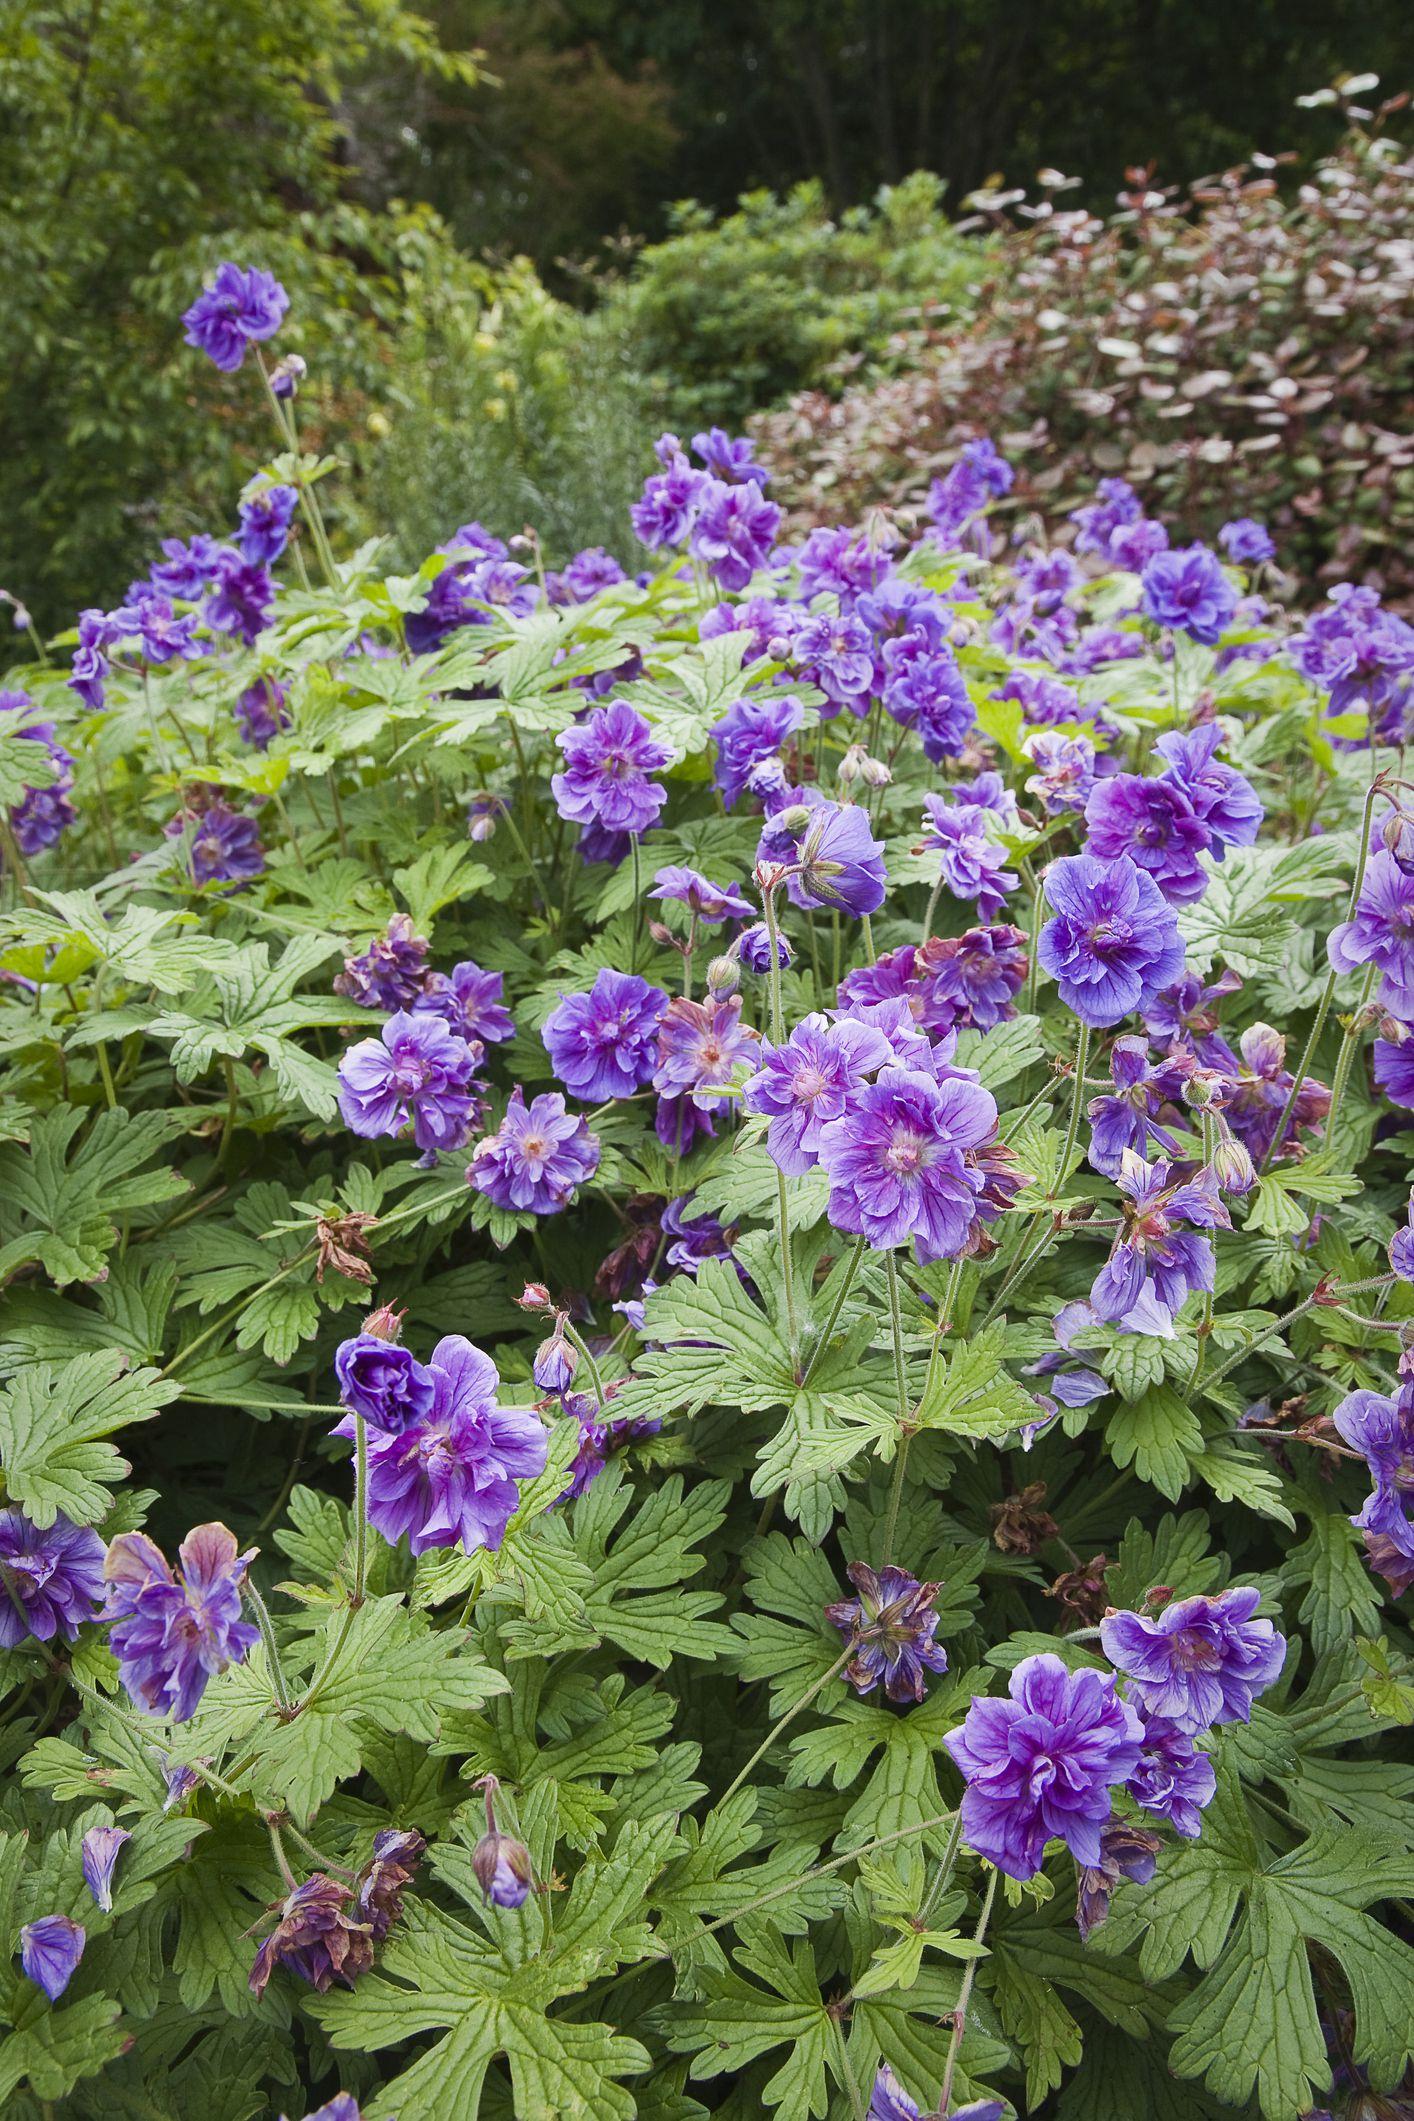 'Plenum' geranium with purple flowers